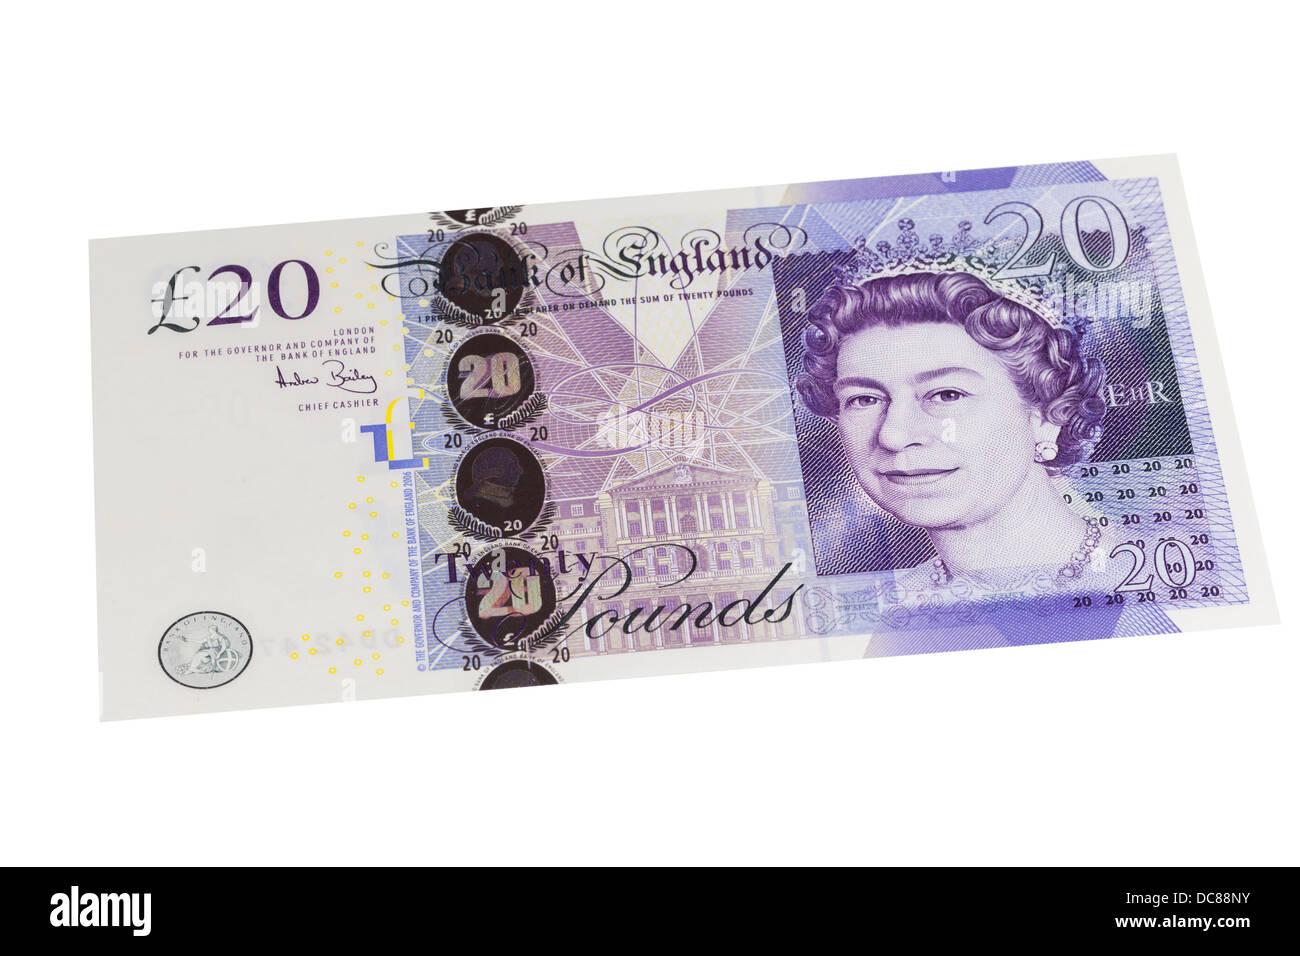 UK twenty pound bill - Stock Image